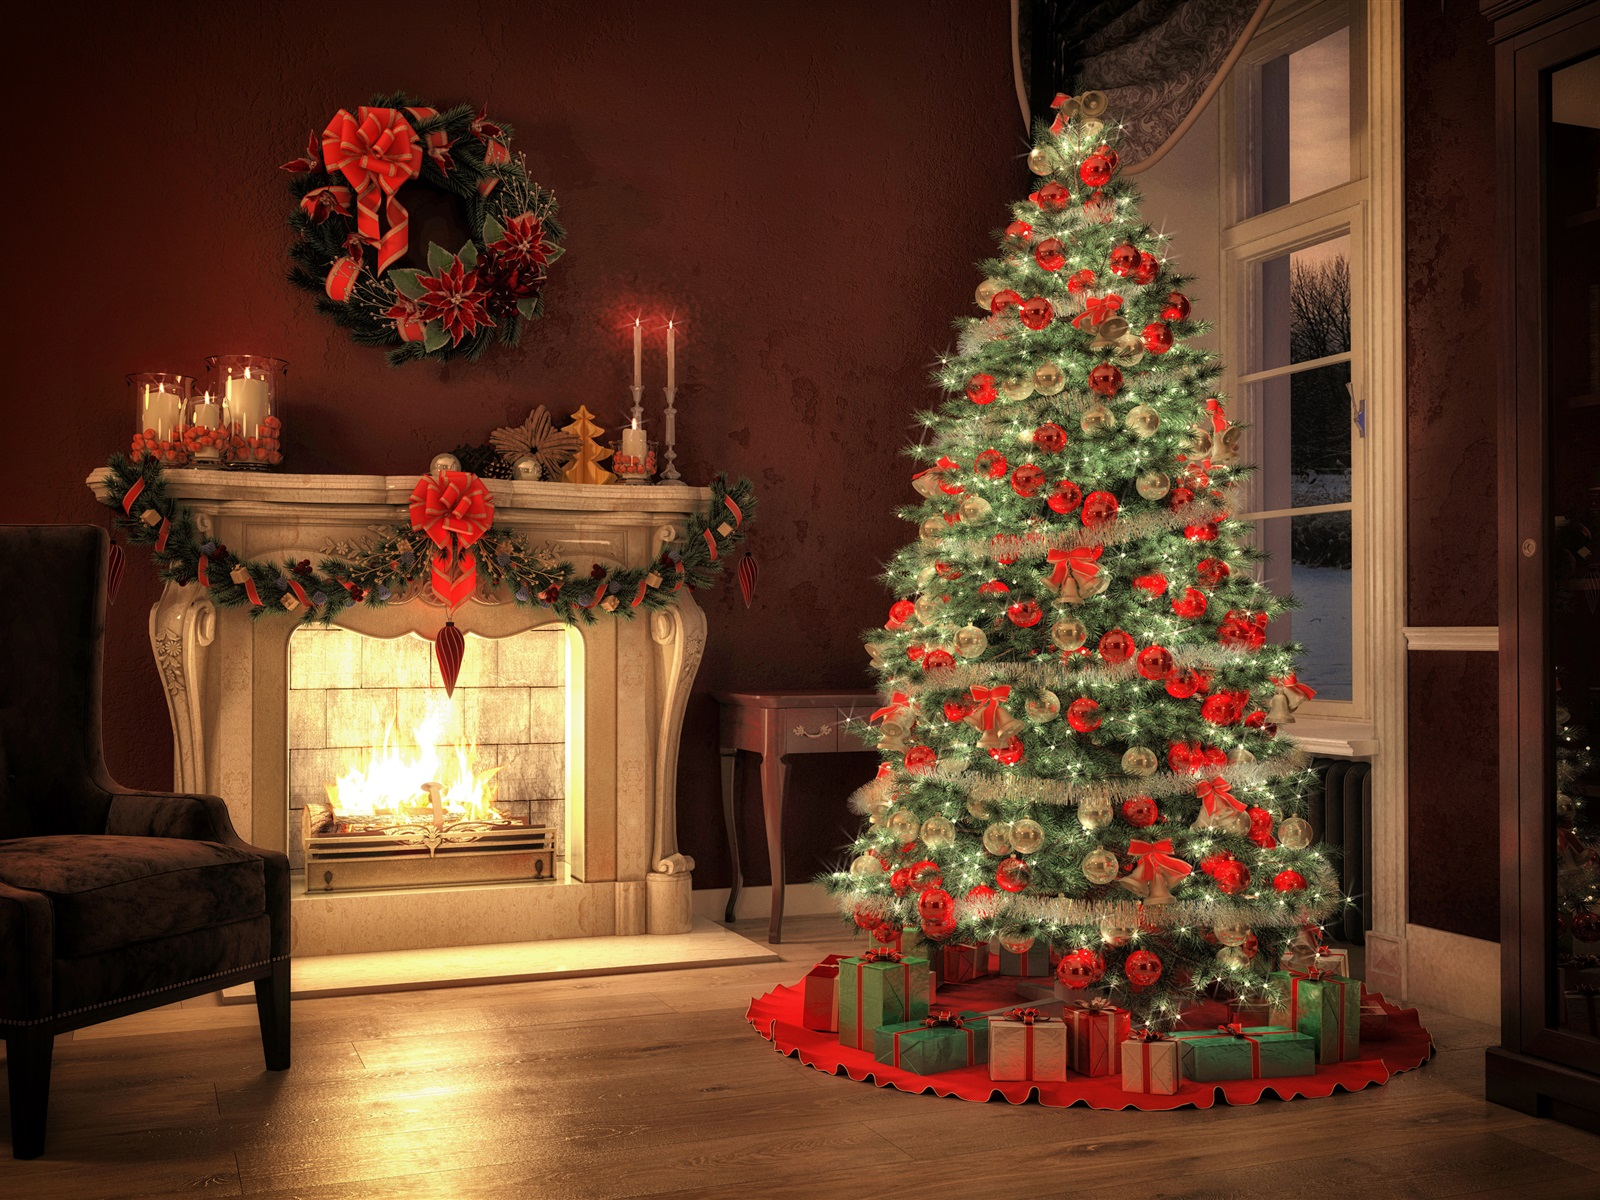 fondos de pantalla rbol de navidad chimenea decoraci n. Black Bedroom Furniture Sets. Home Design Ideas